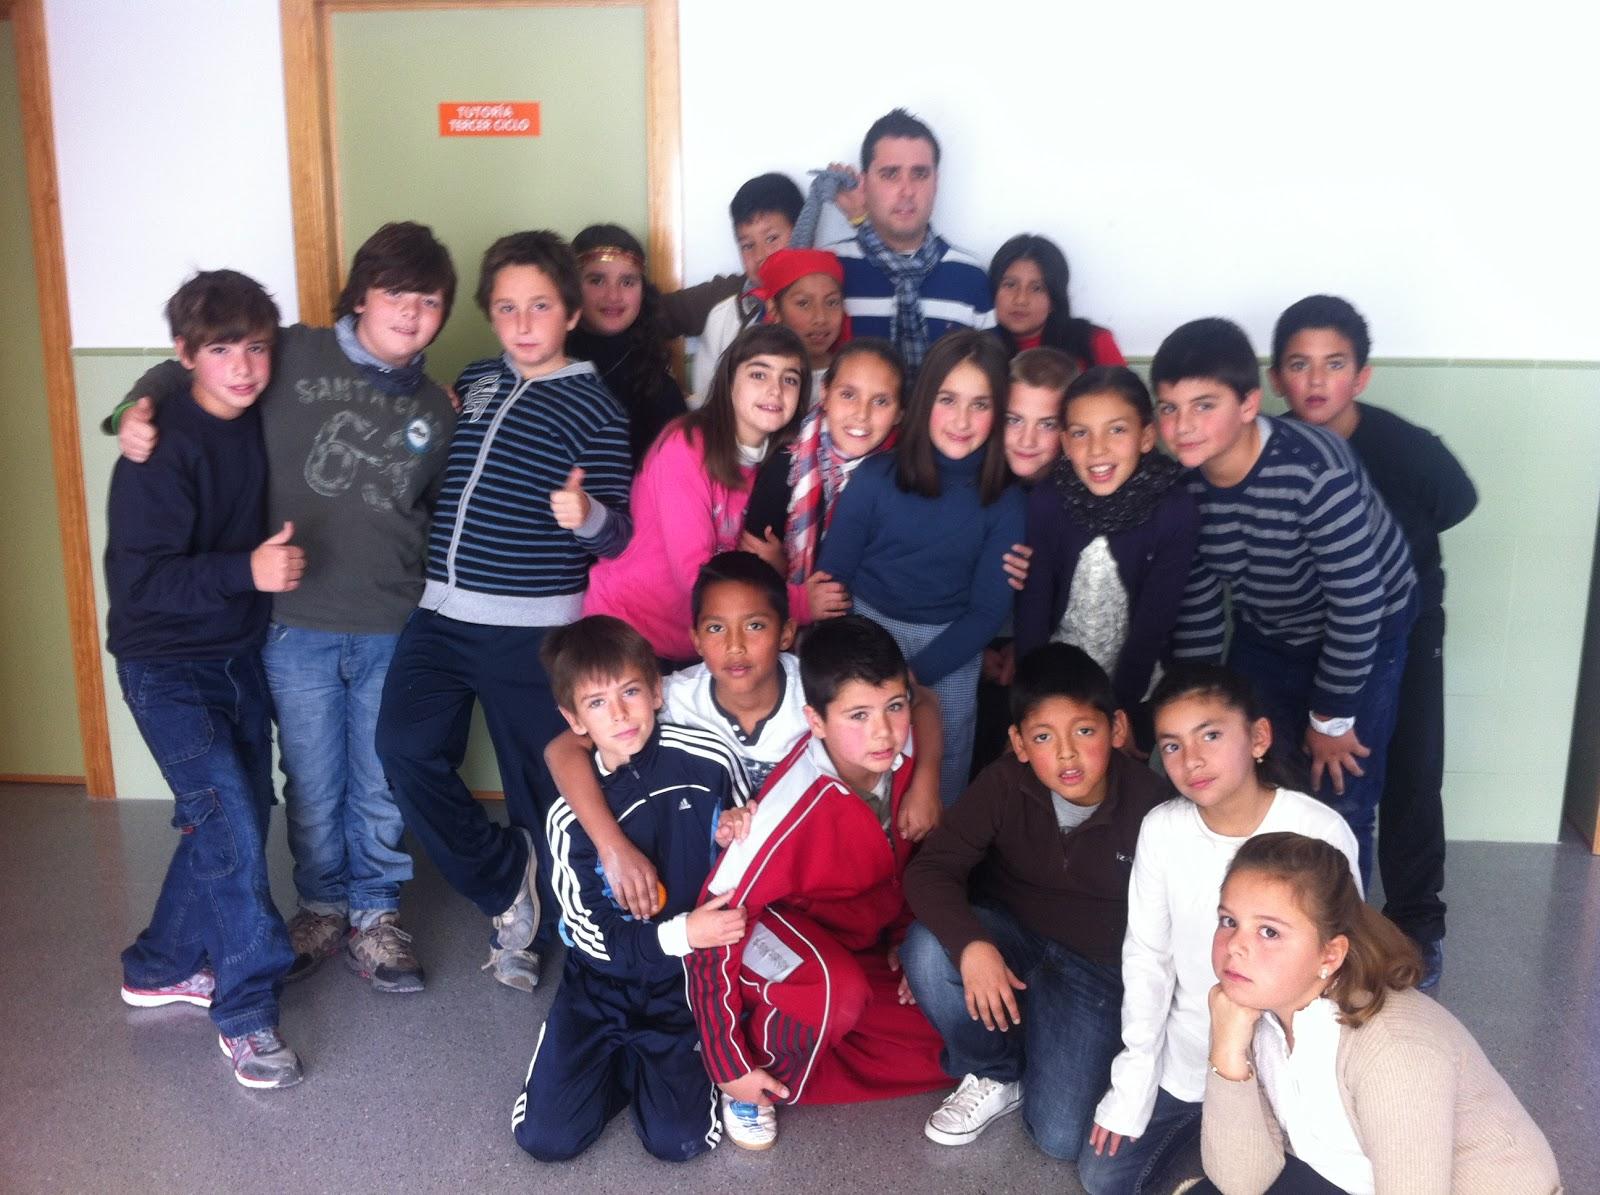 2011/12 CEIP SAN JOSÉ DE CALASANZ 5ºB (YECLA)